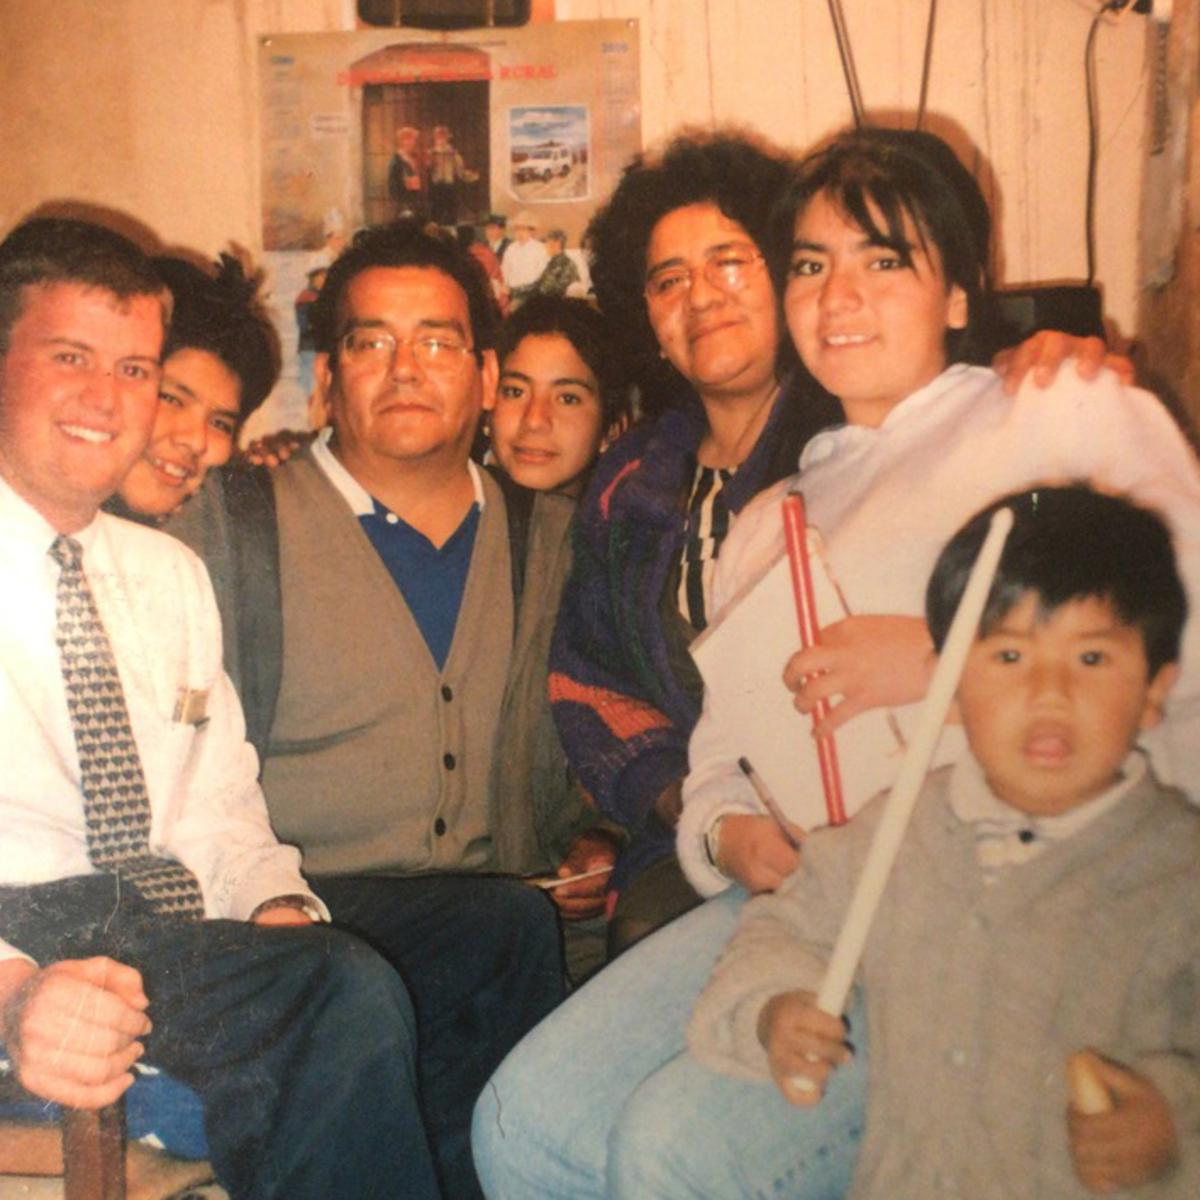 Una familia SUD con un misionero que les enseñaba.